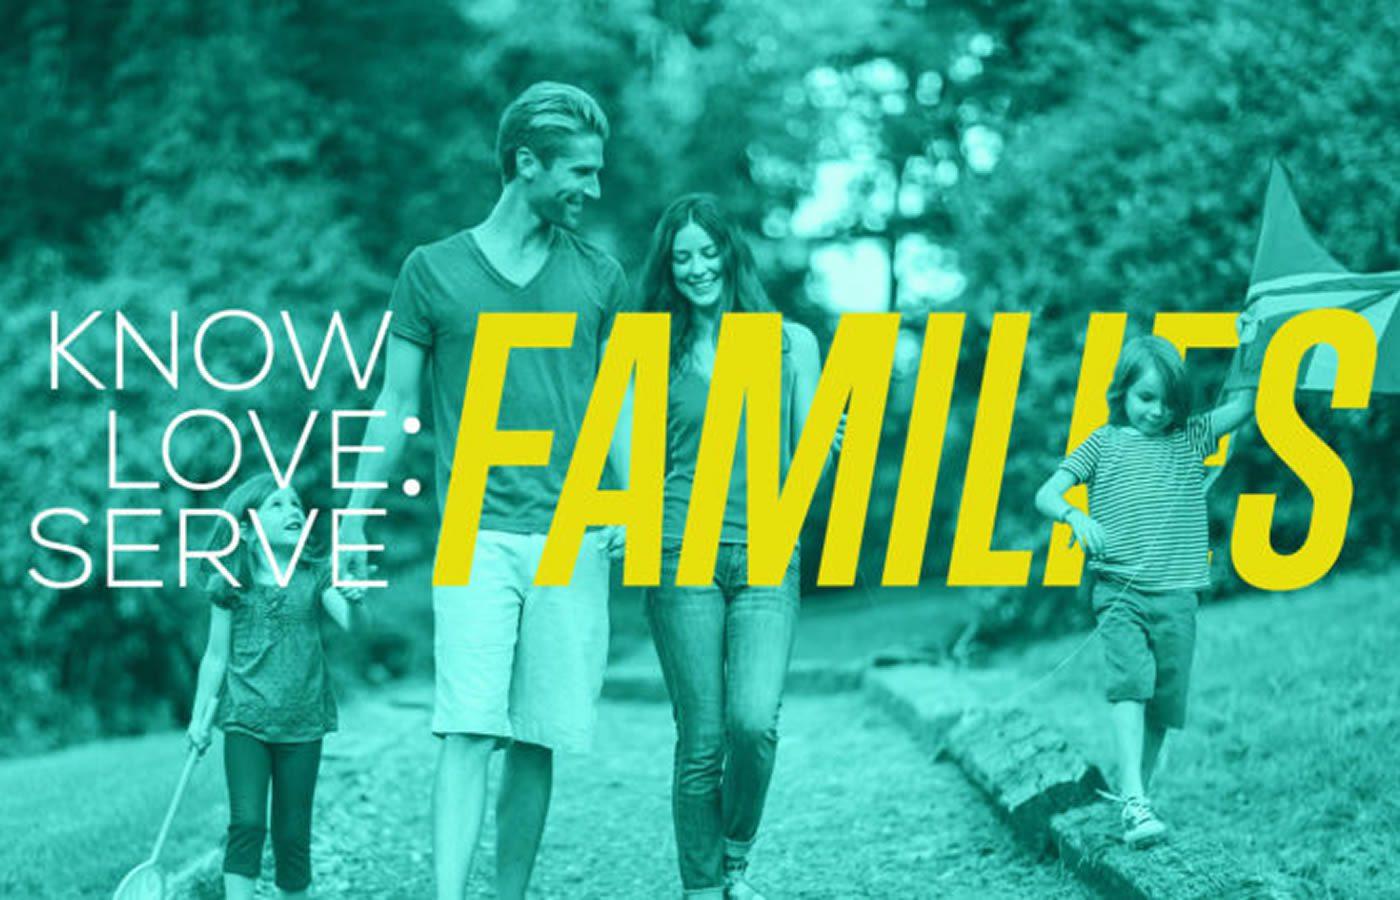 Know, Love, Serve … Families (Part 4 of 5)